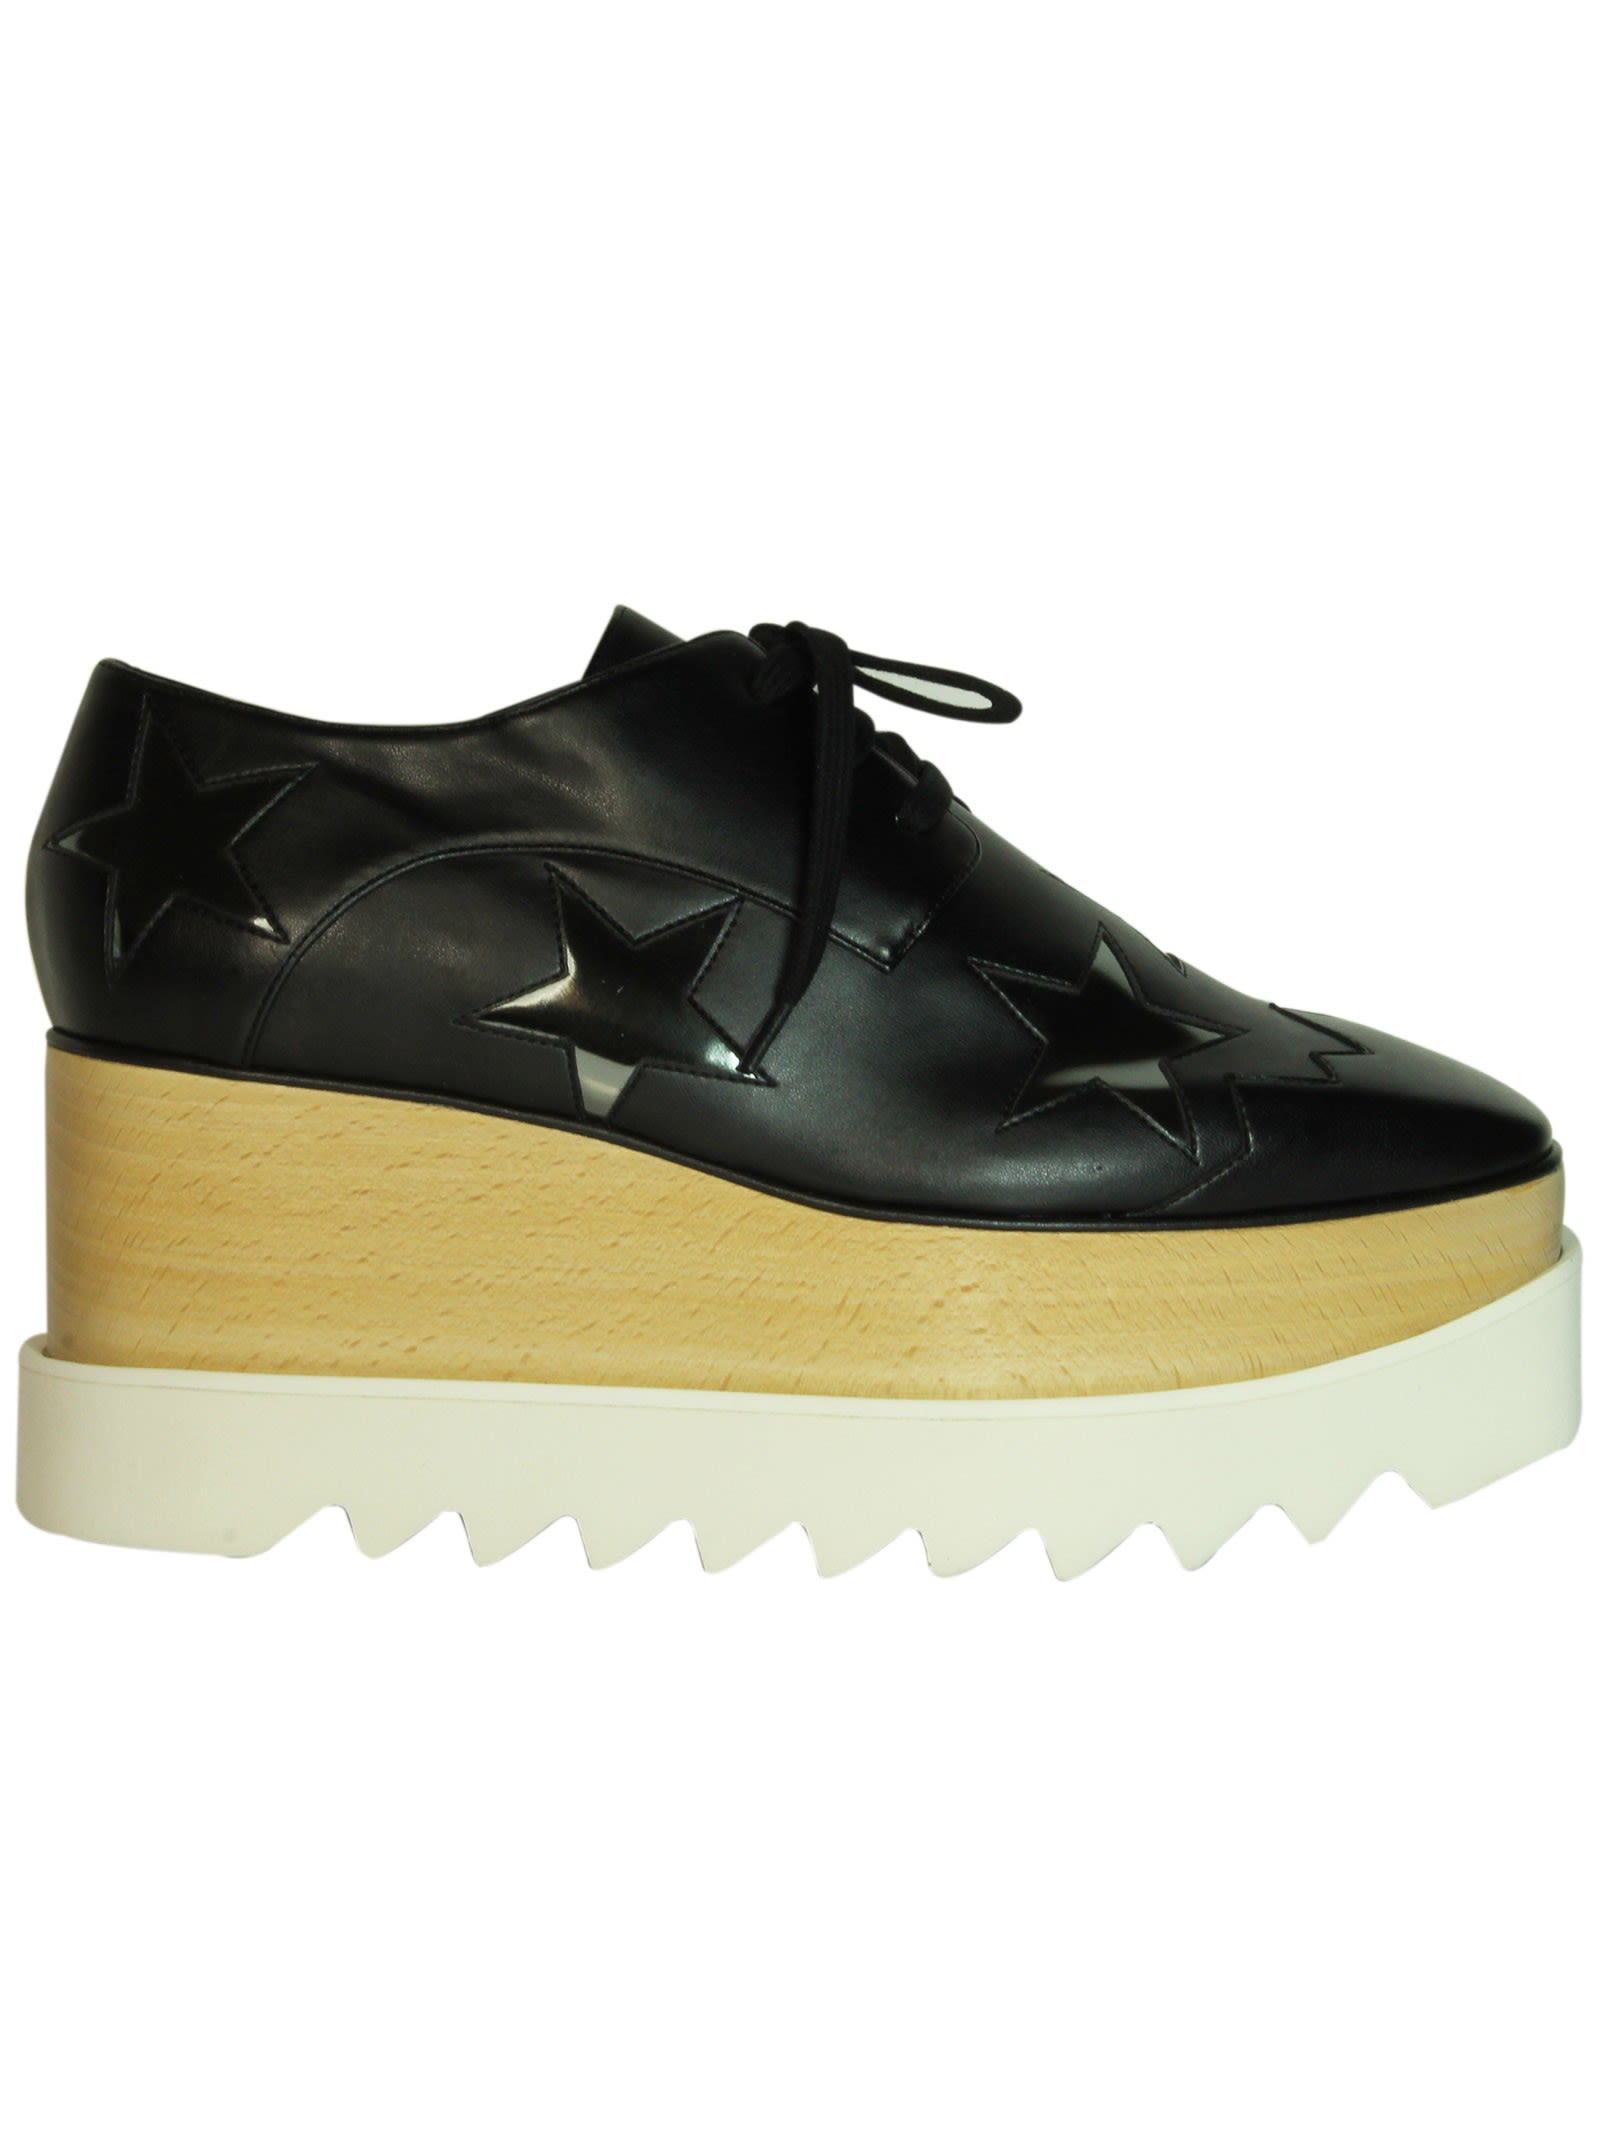 Black Zync Star Elyse Platform Shoes